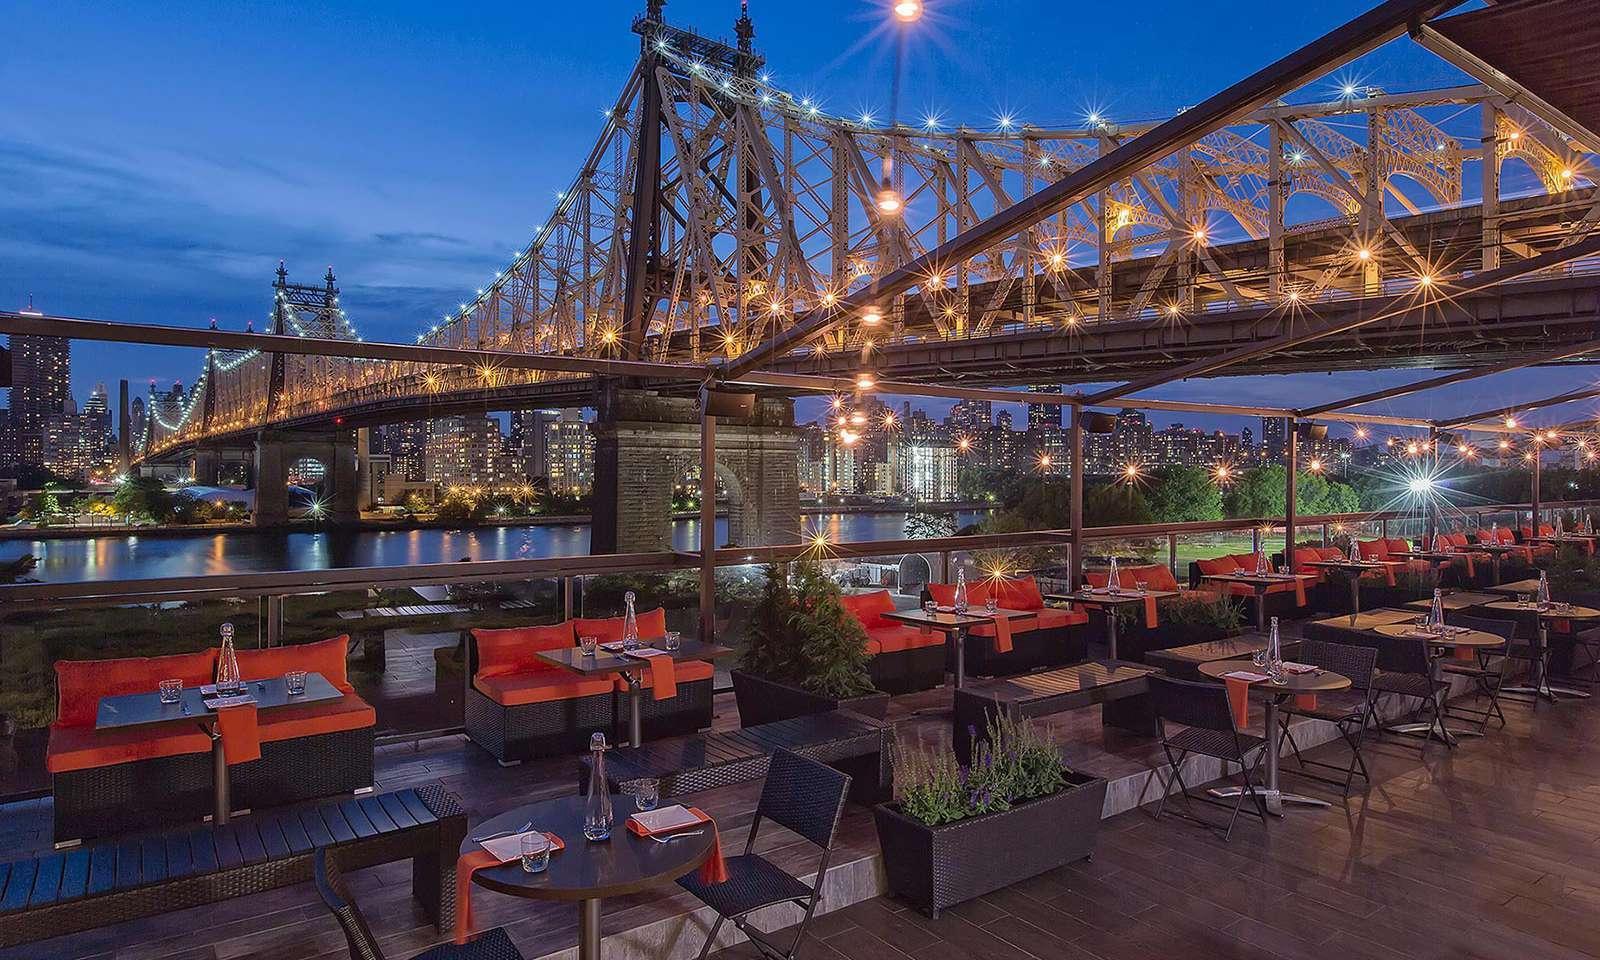 Penthouse808-Rooftop-bar-New-York-15-1600x960